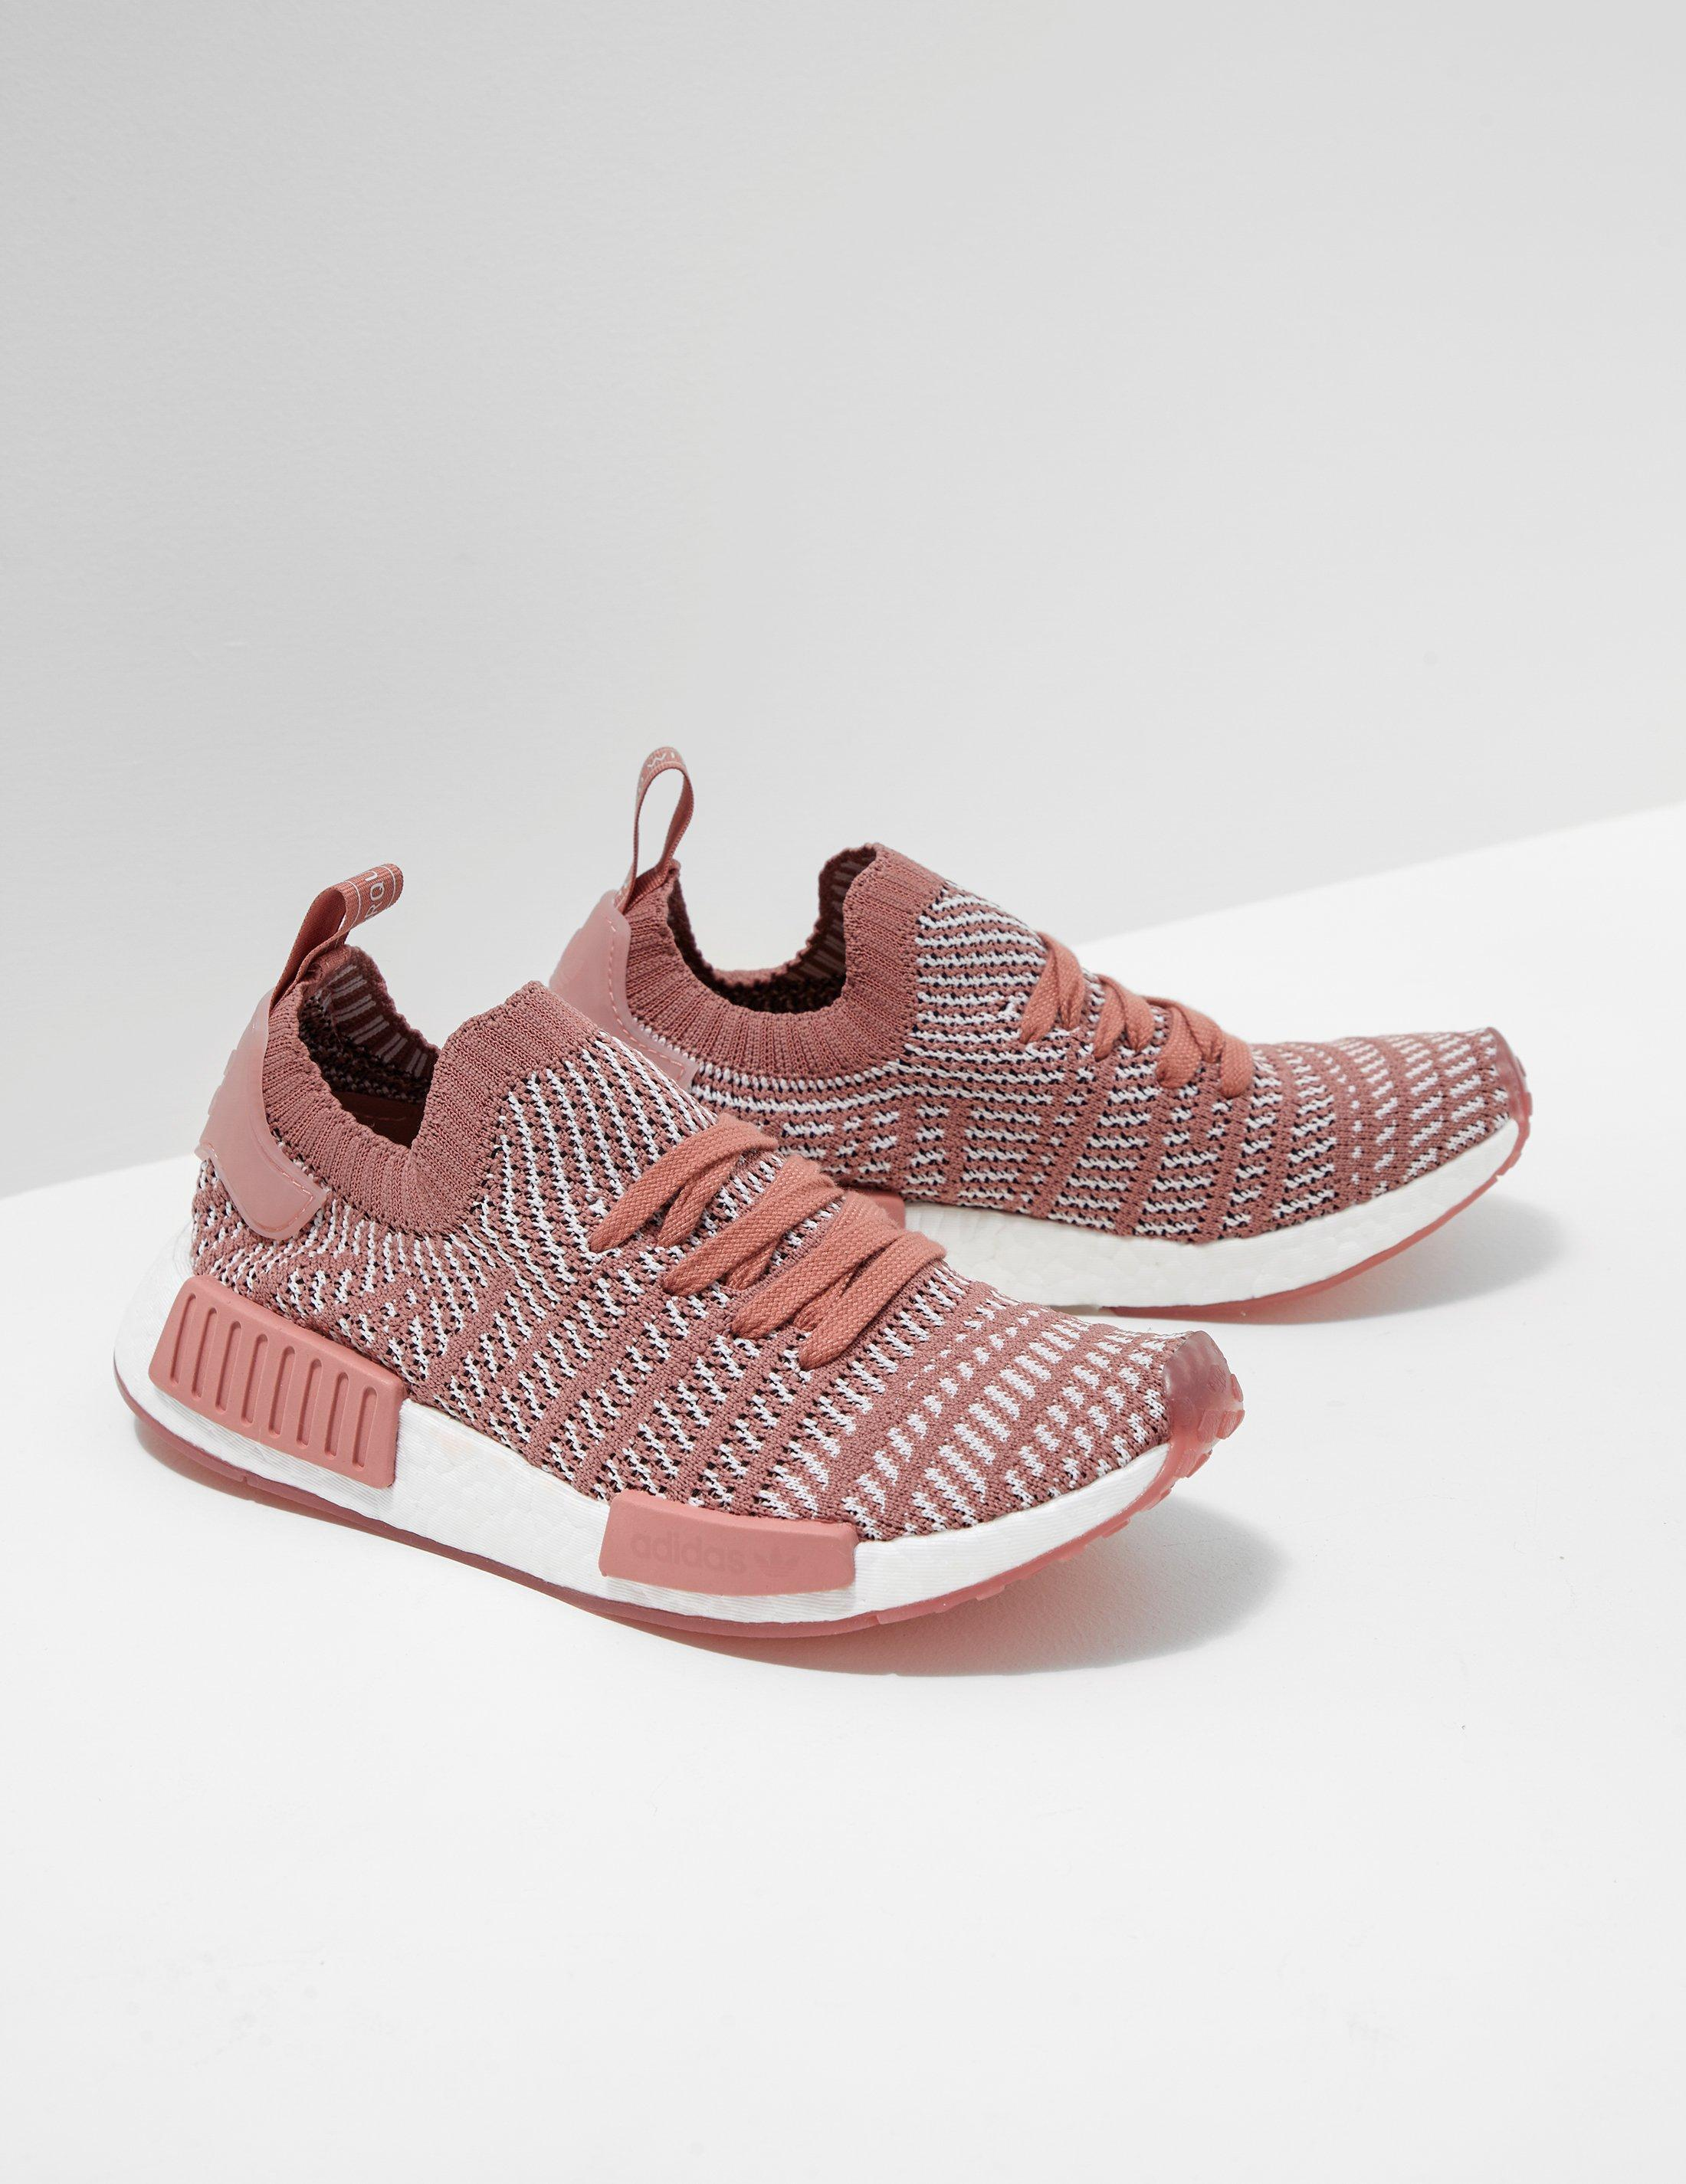 Adidas Originals Womens Nmd R1 Stlt Primeknit Women S Pink In Pink